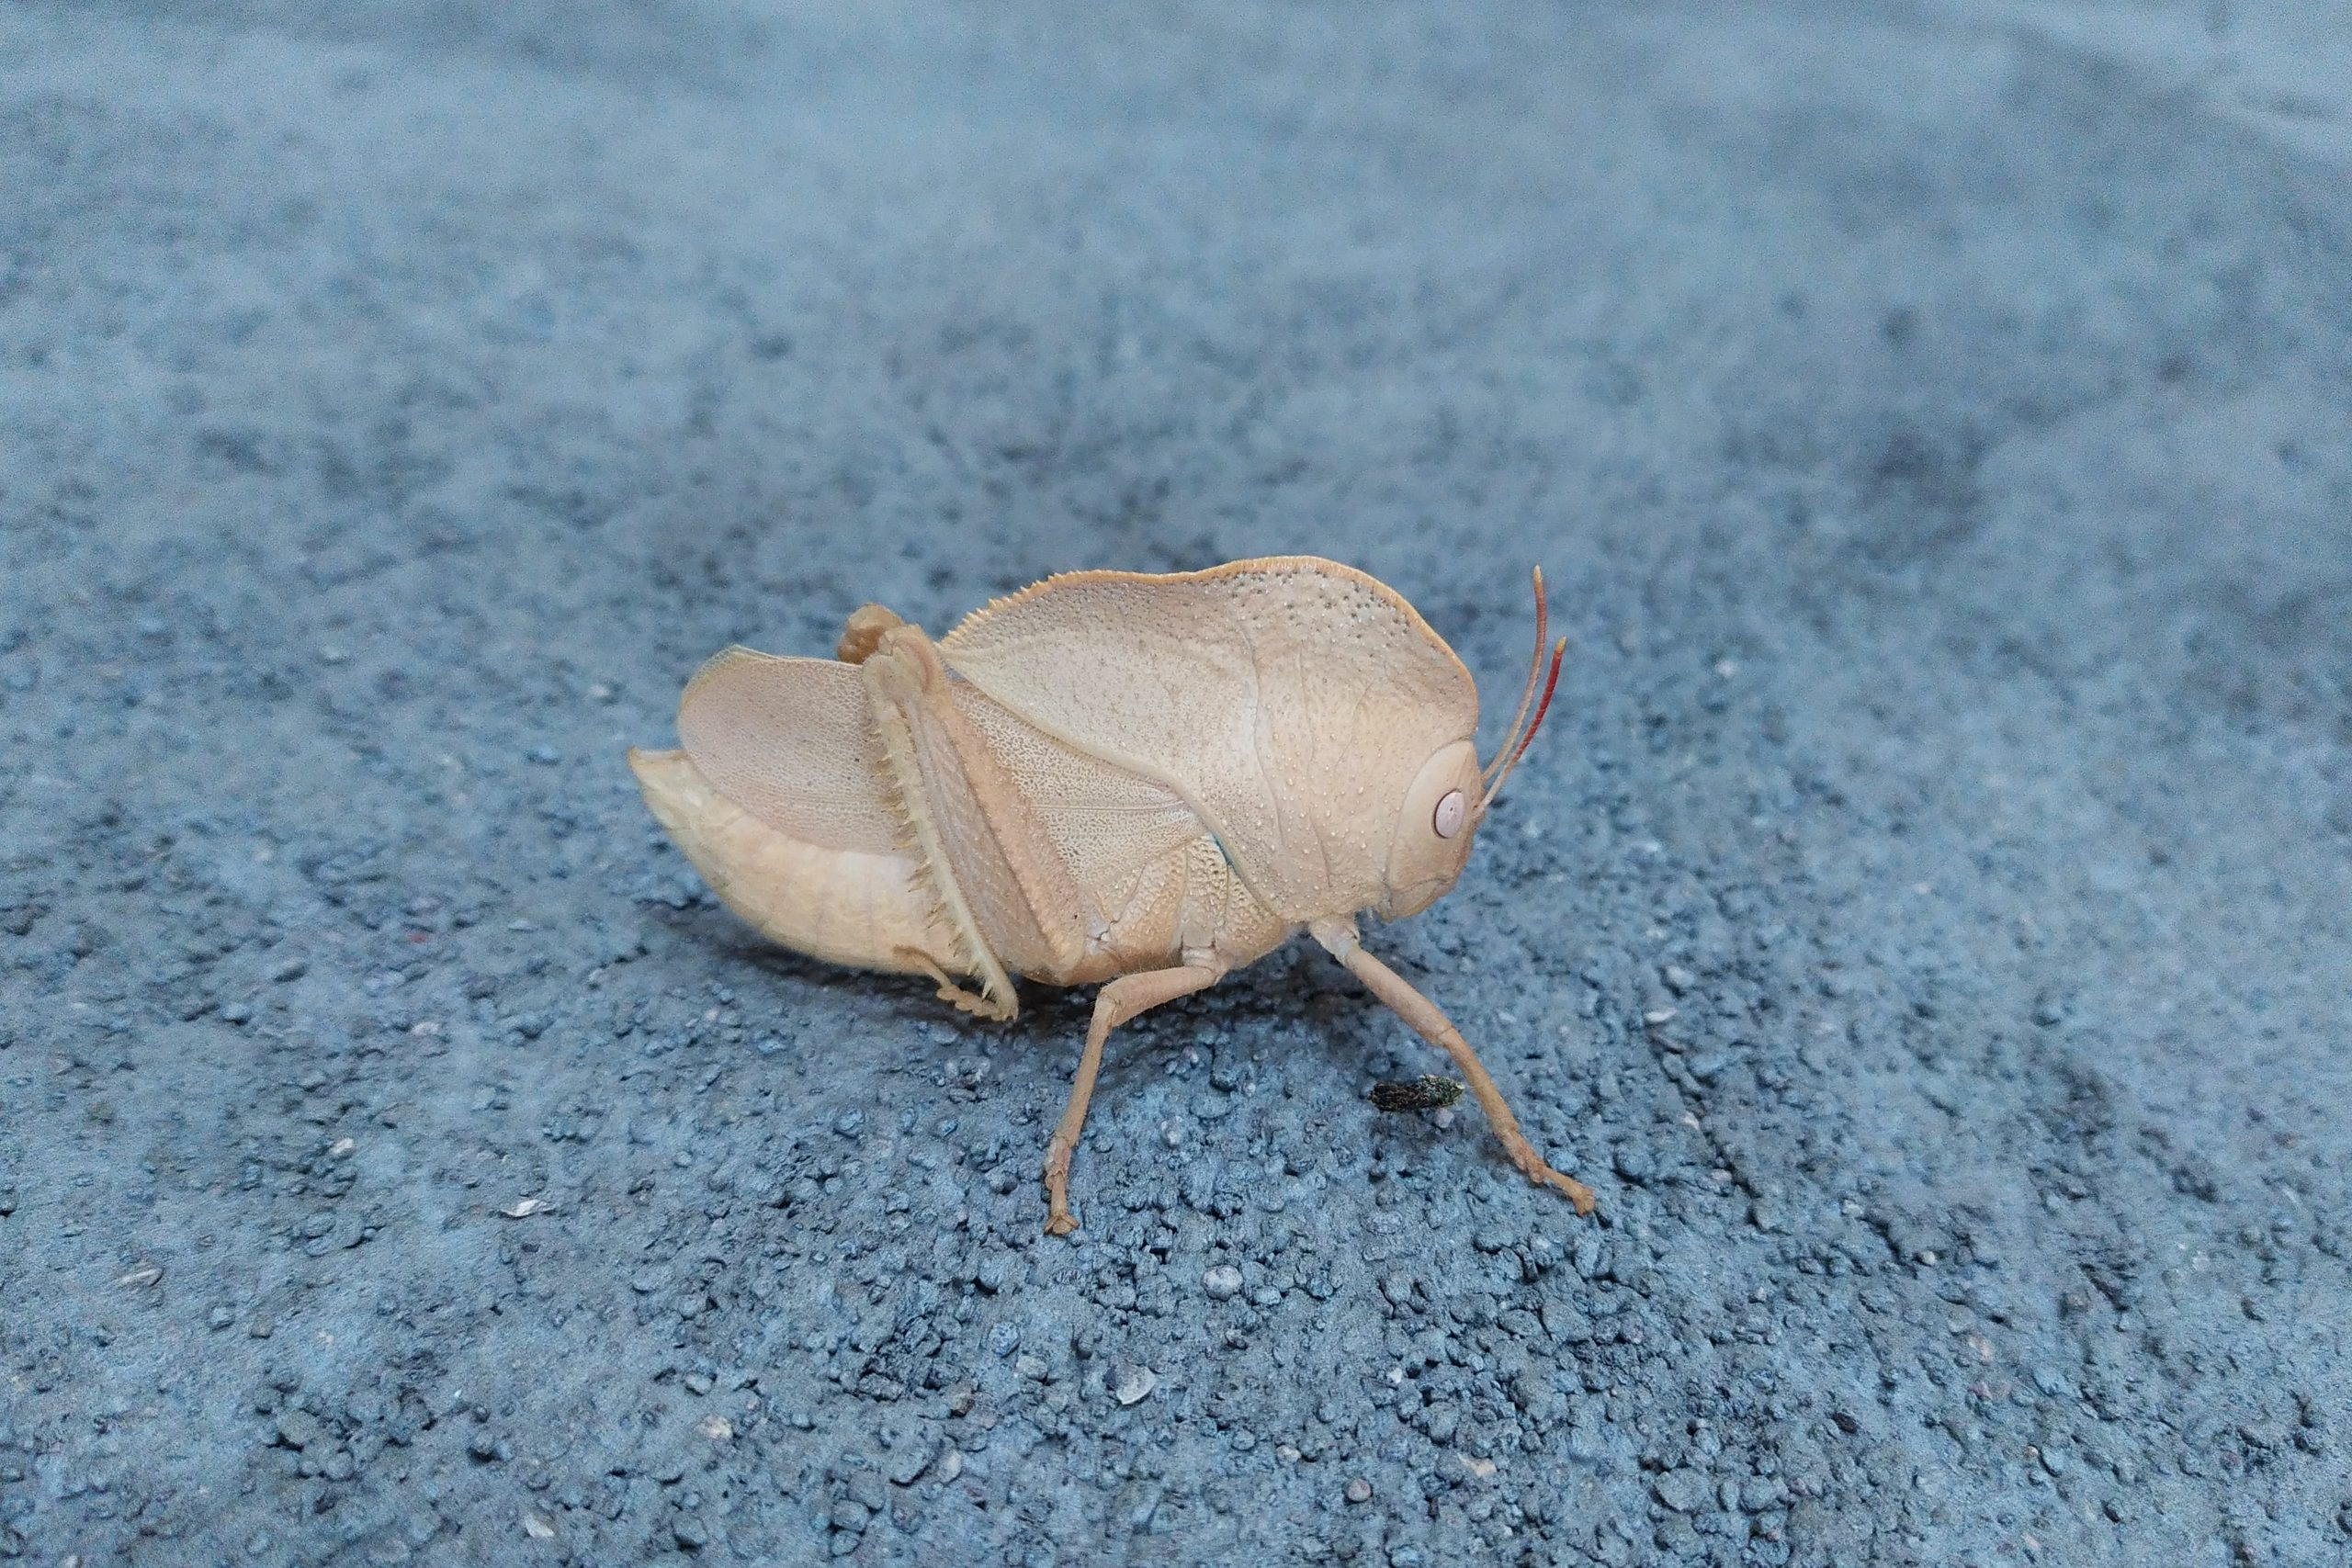 A grasshopper on a surface